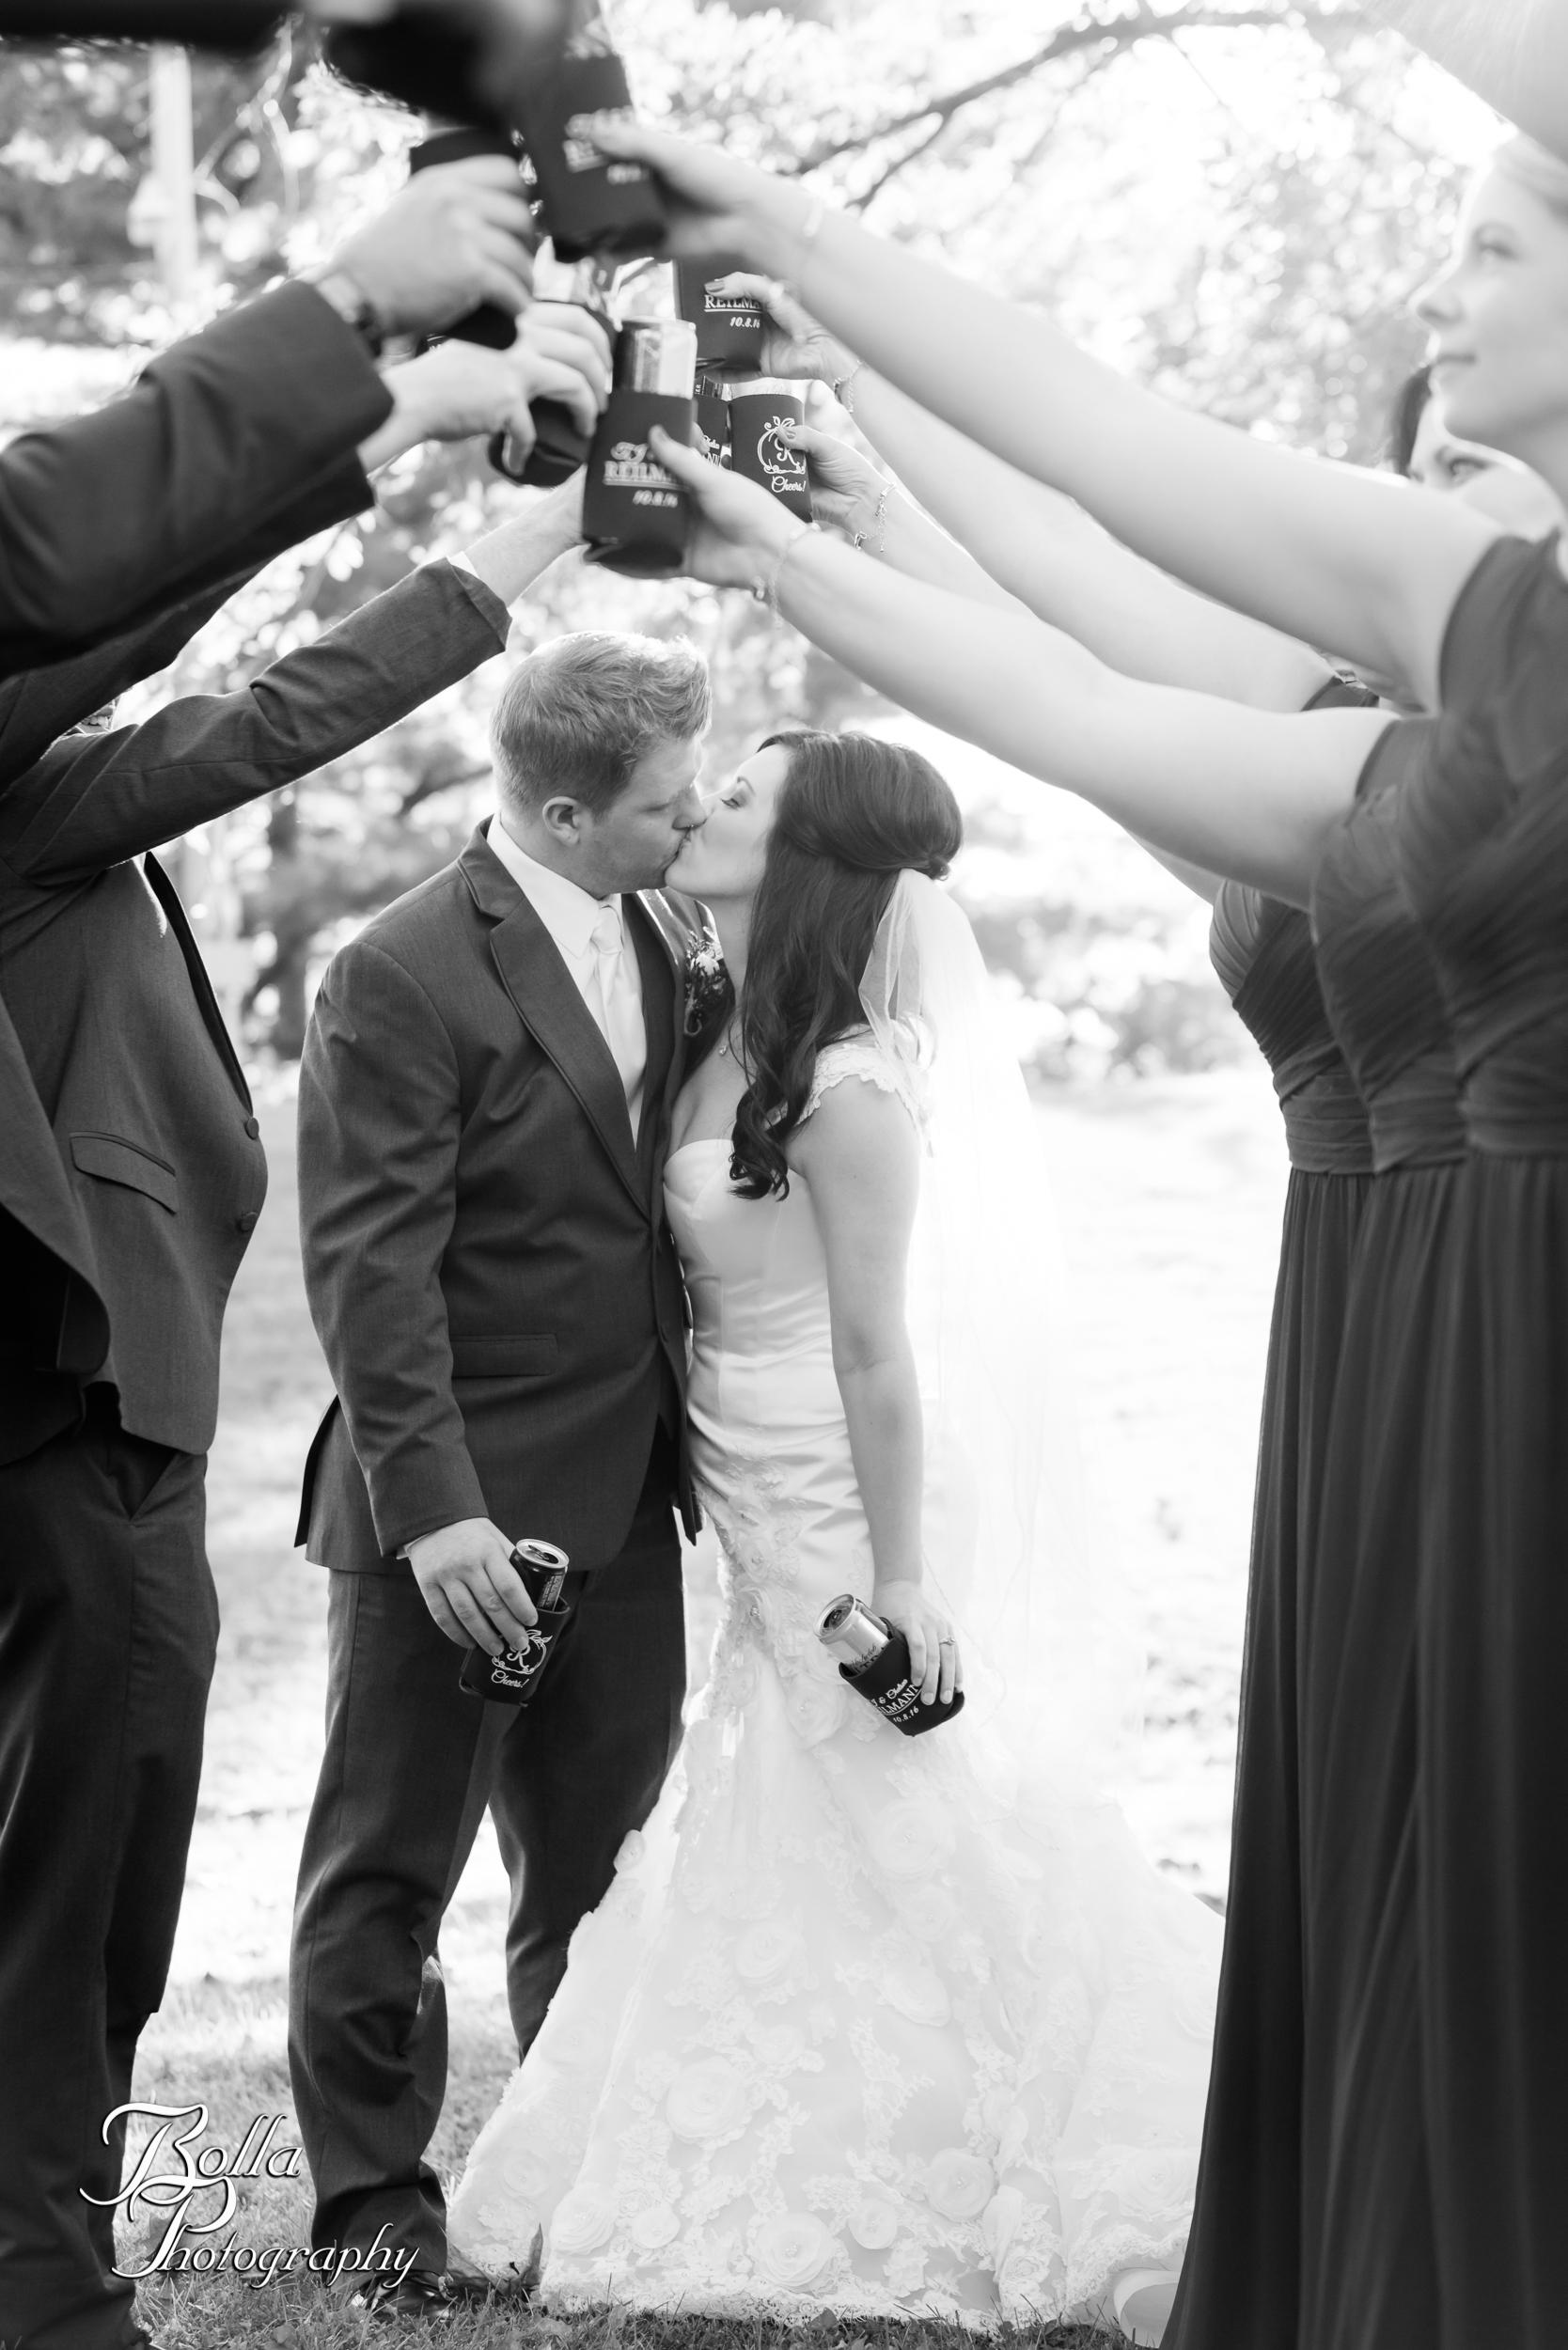 Bolla_photography_edwardsville_wedding_photographer_st_louis_weddings_Reilmann-0385.jpg